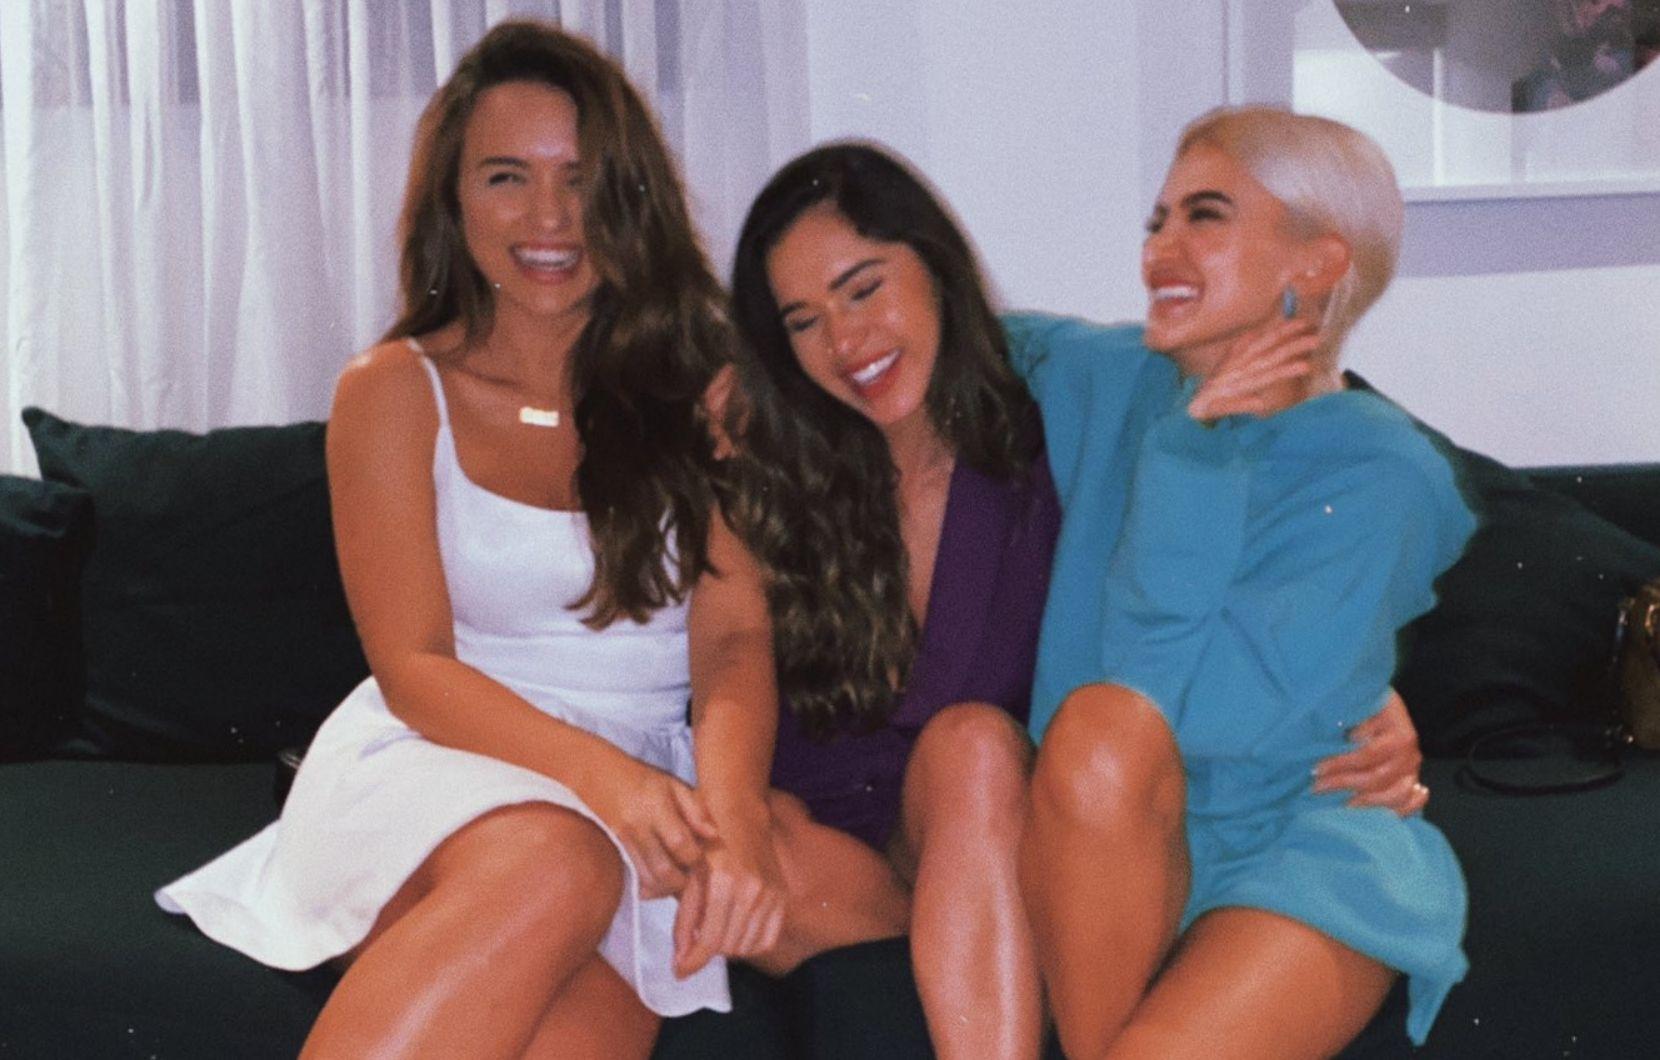 Rafa Kalimann, Manu Gavassi e Gizelly Bicalho se reencontram pela primeira vez após BBB20